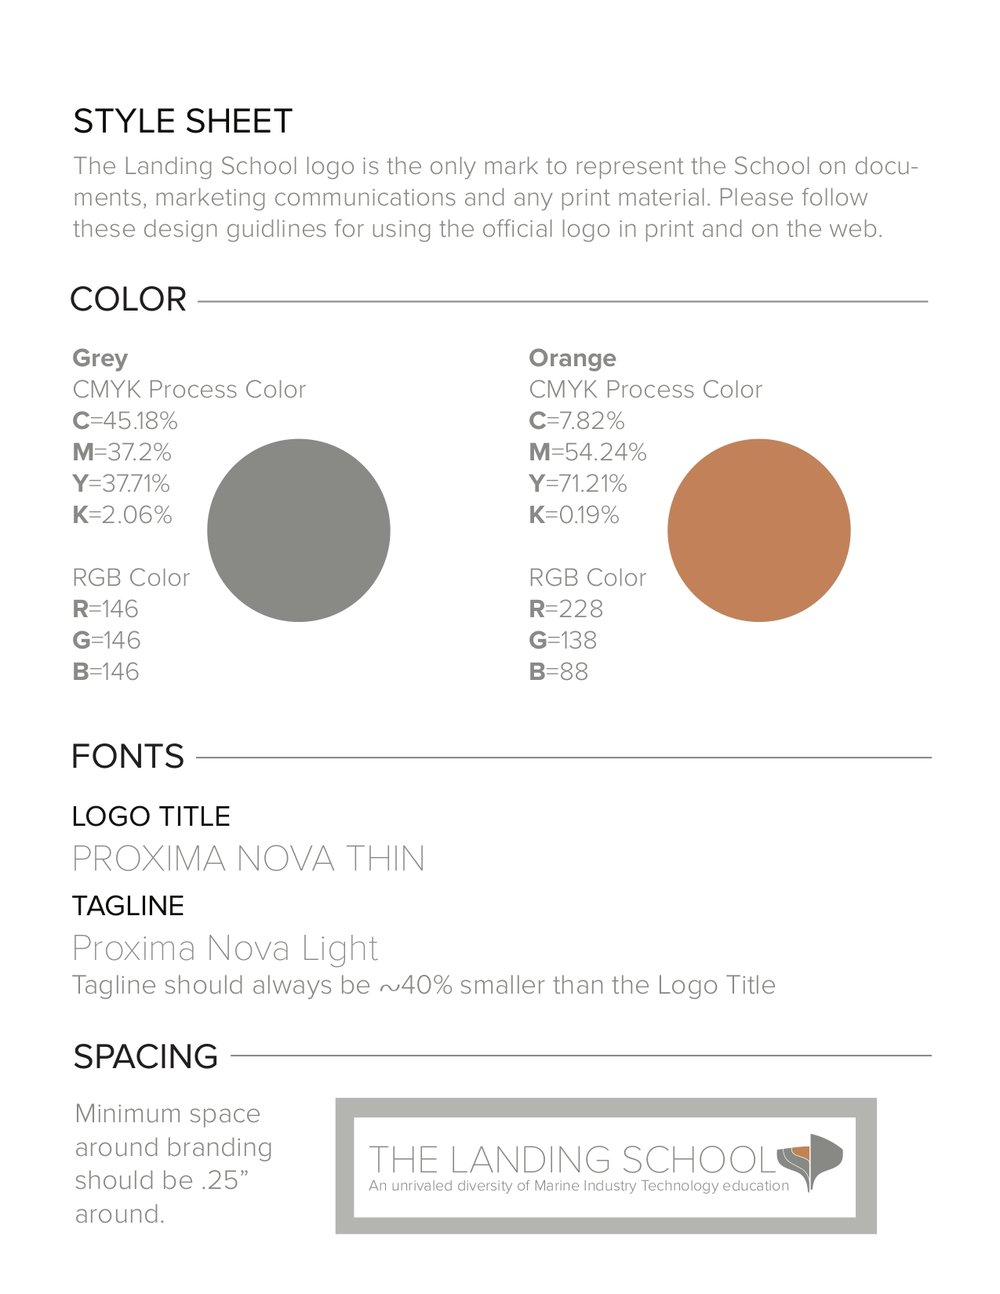 2016 Style Sheet.jpg